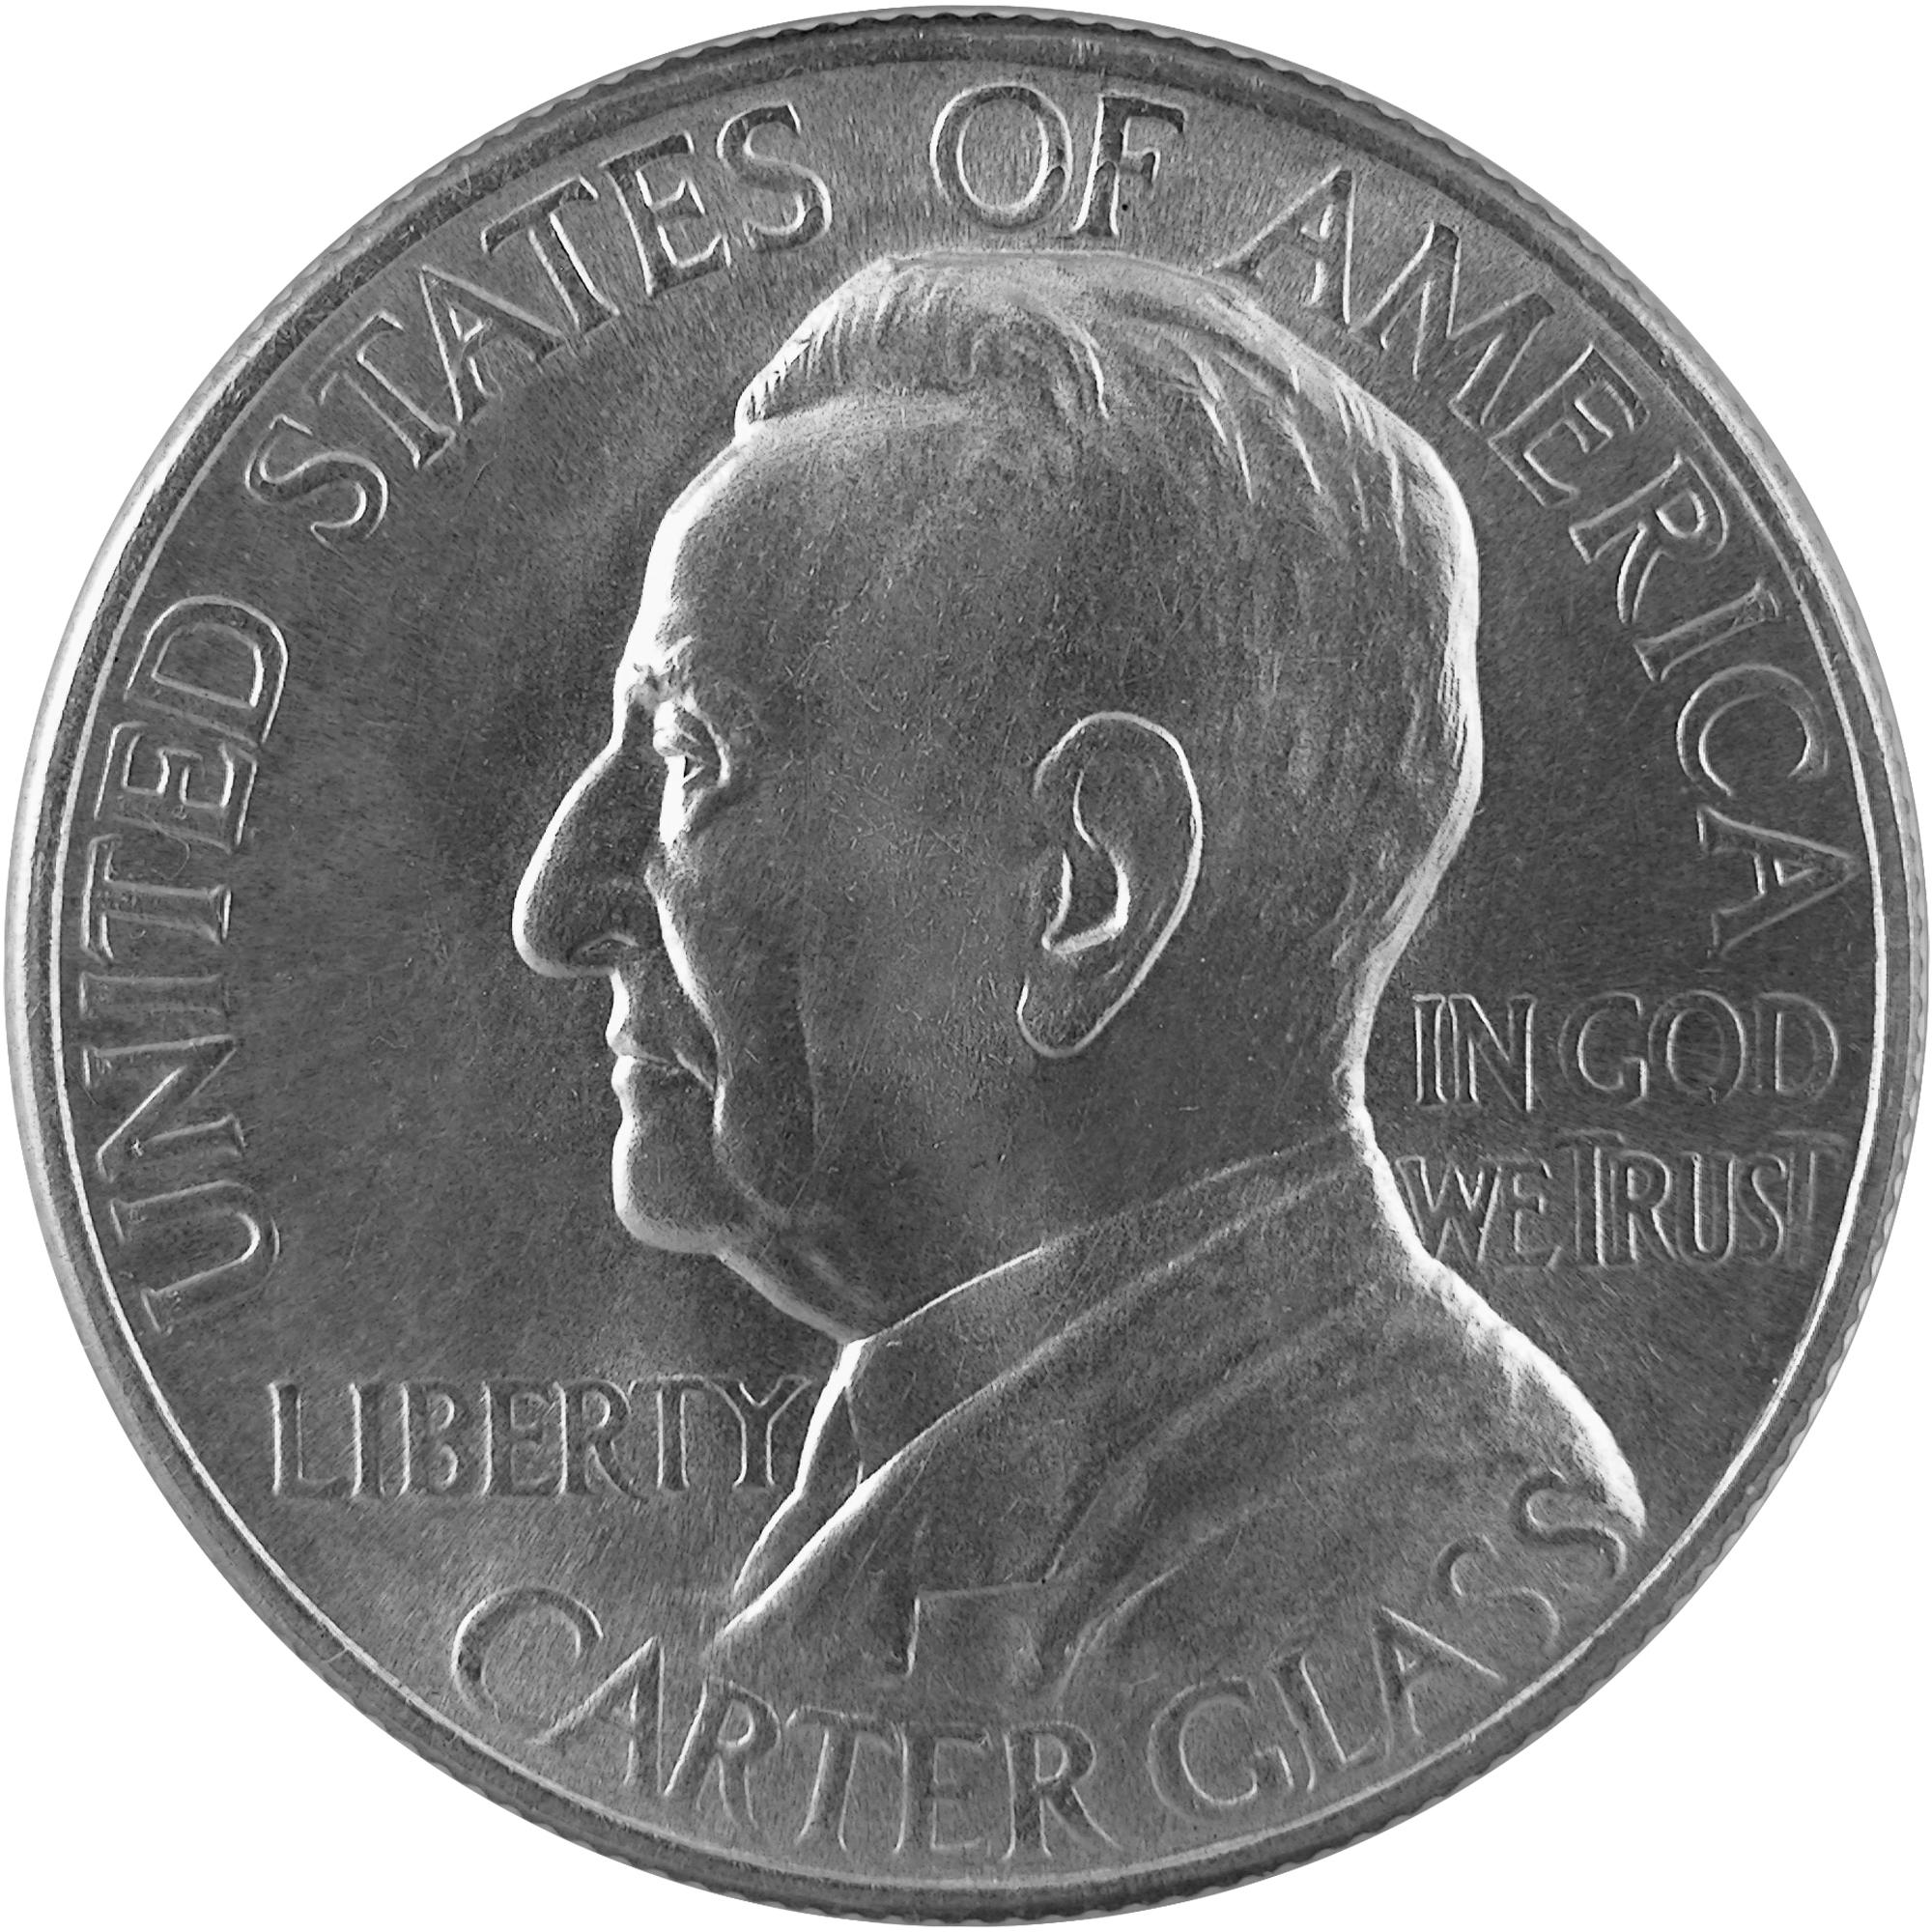 1936 Lynchburg Virginia Sesquicentennial Commemorative Silver Half Dollar Coin Obverse